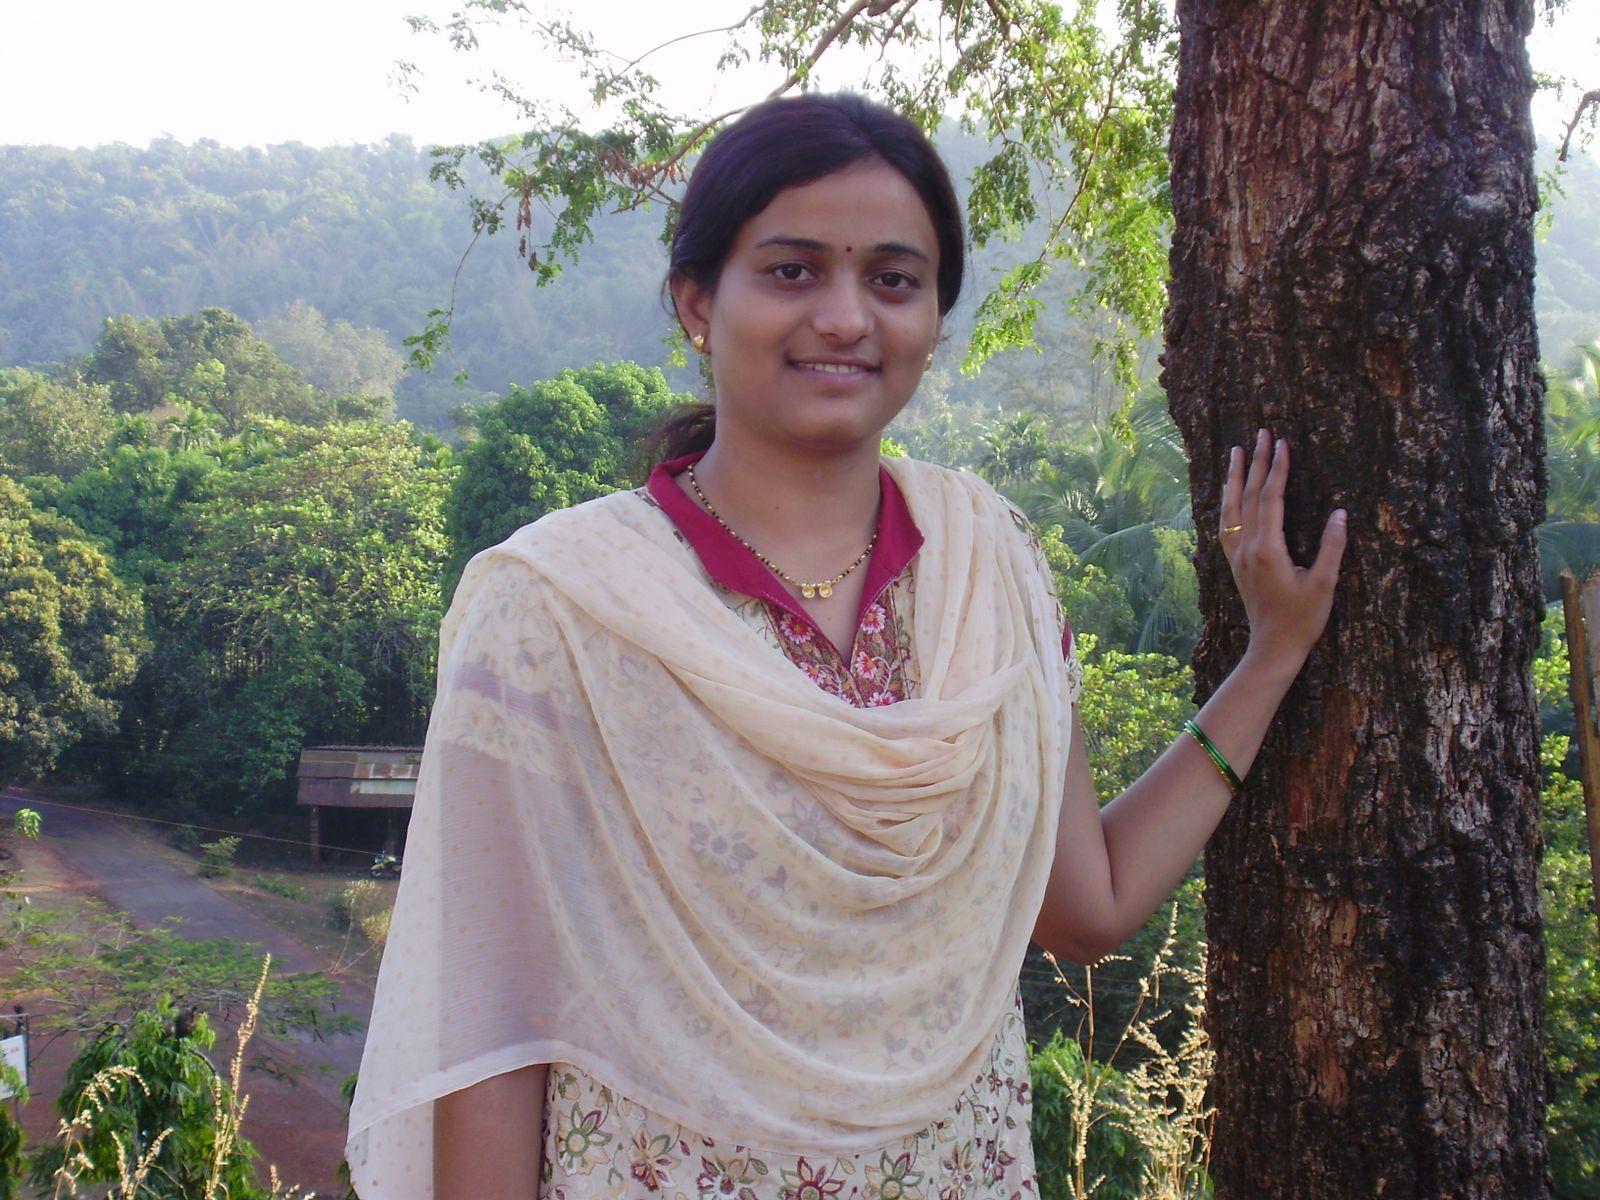 Smile Beauty TamilAunties girls - Beauty Tamil Nadu